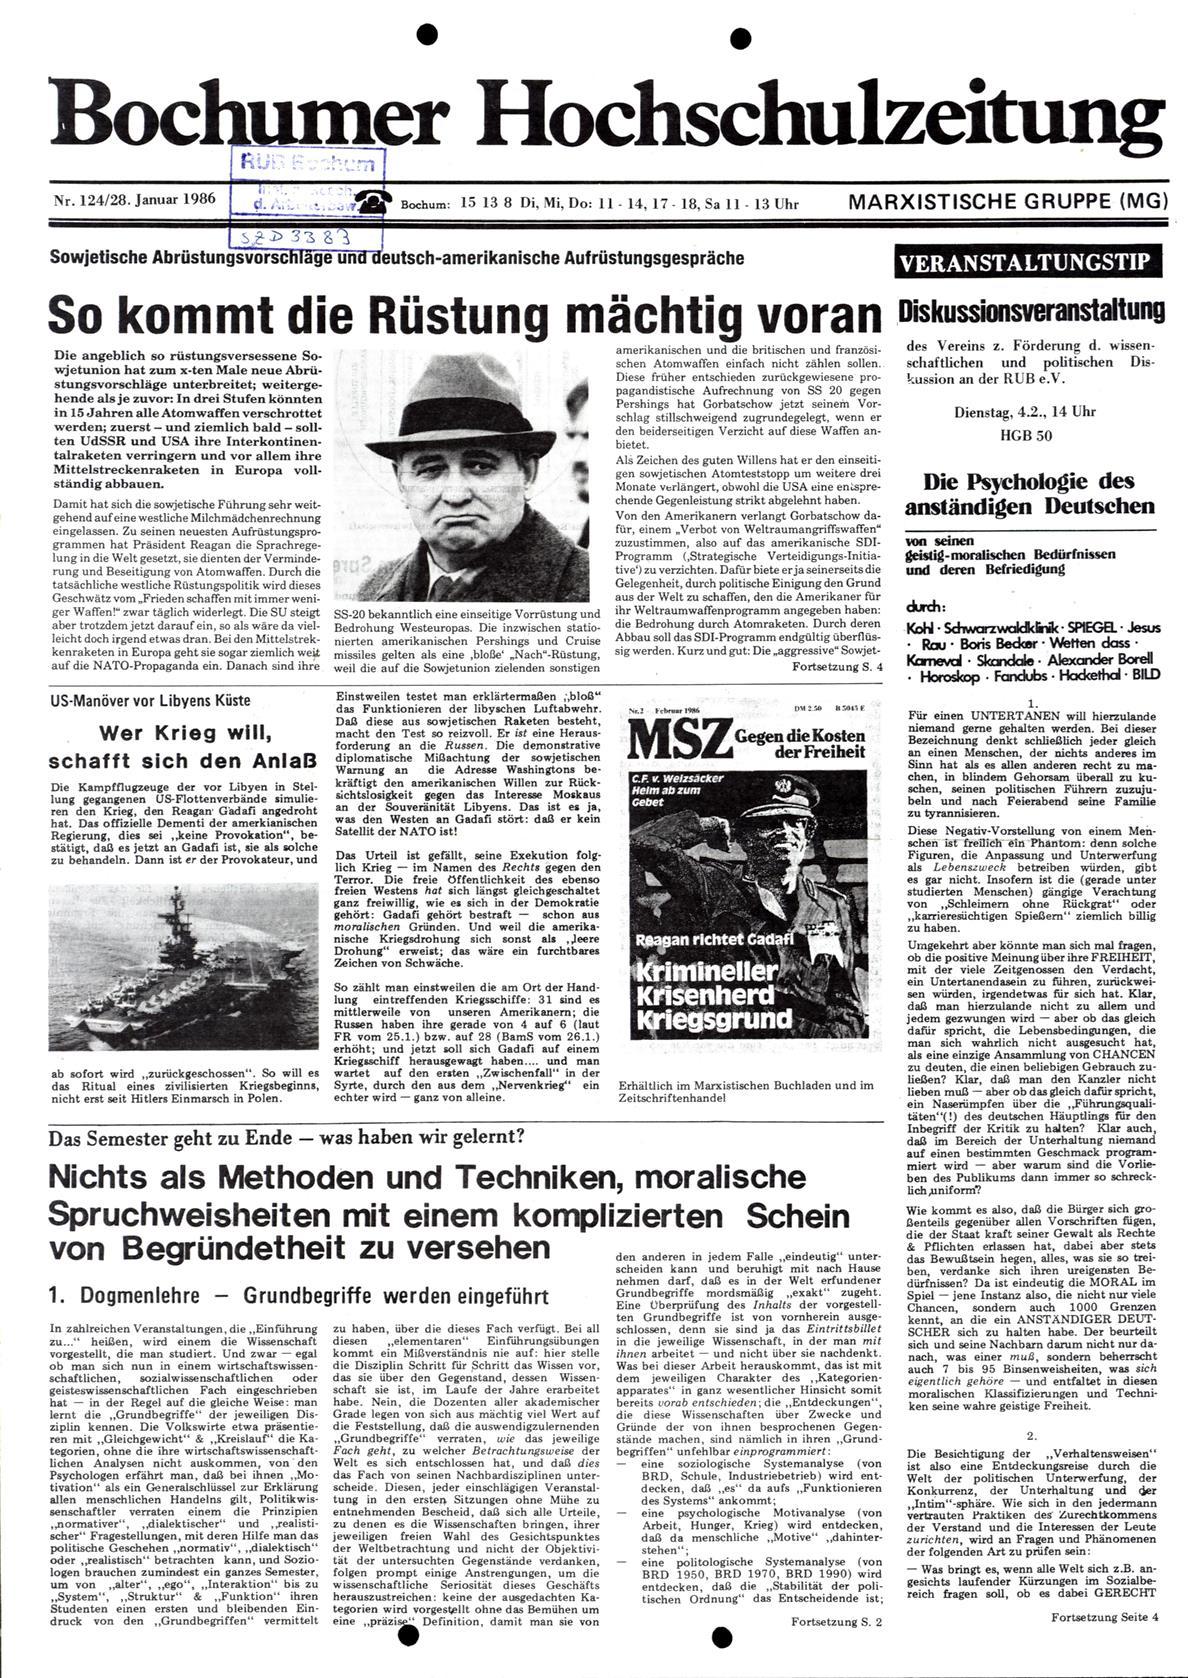 Bochum_BHZ_19860128_124_001